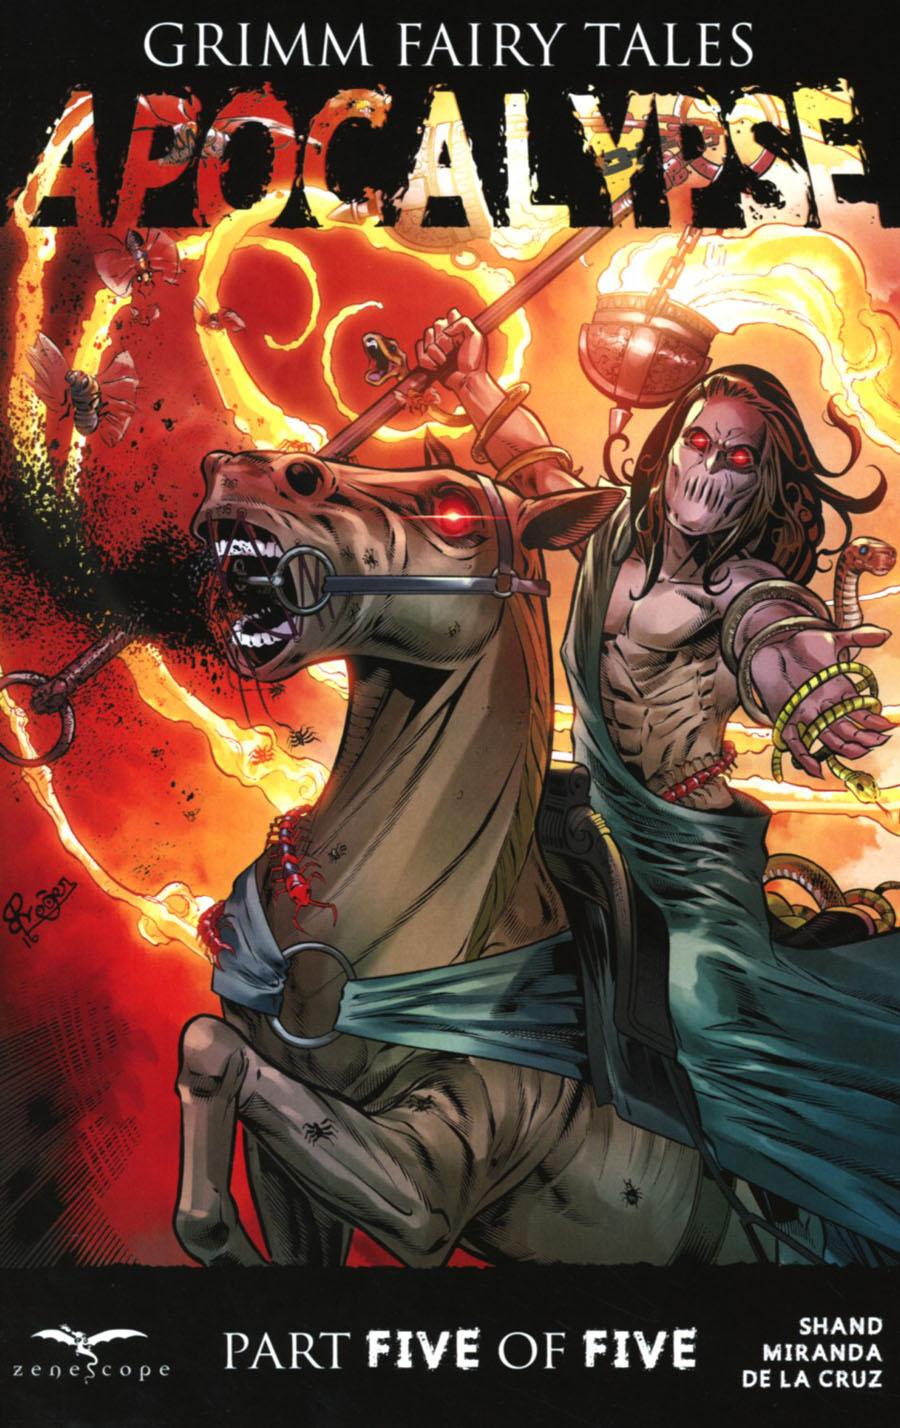 Grimm Fairy Tales Presents Apocalypse #5 Cover D Roger Bonet